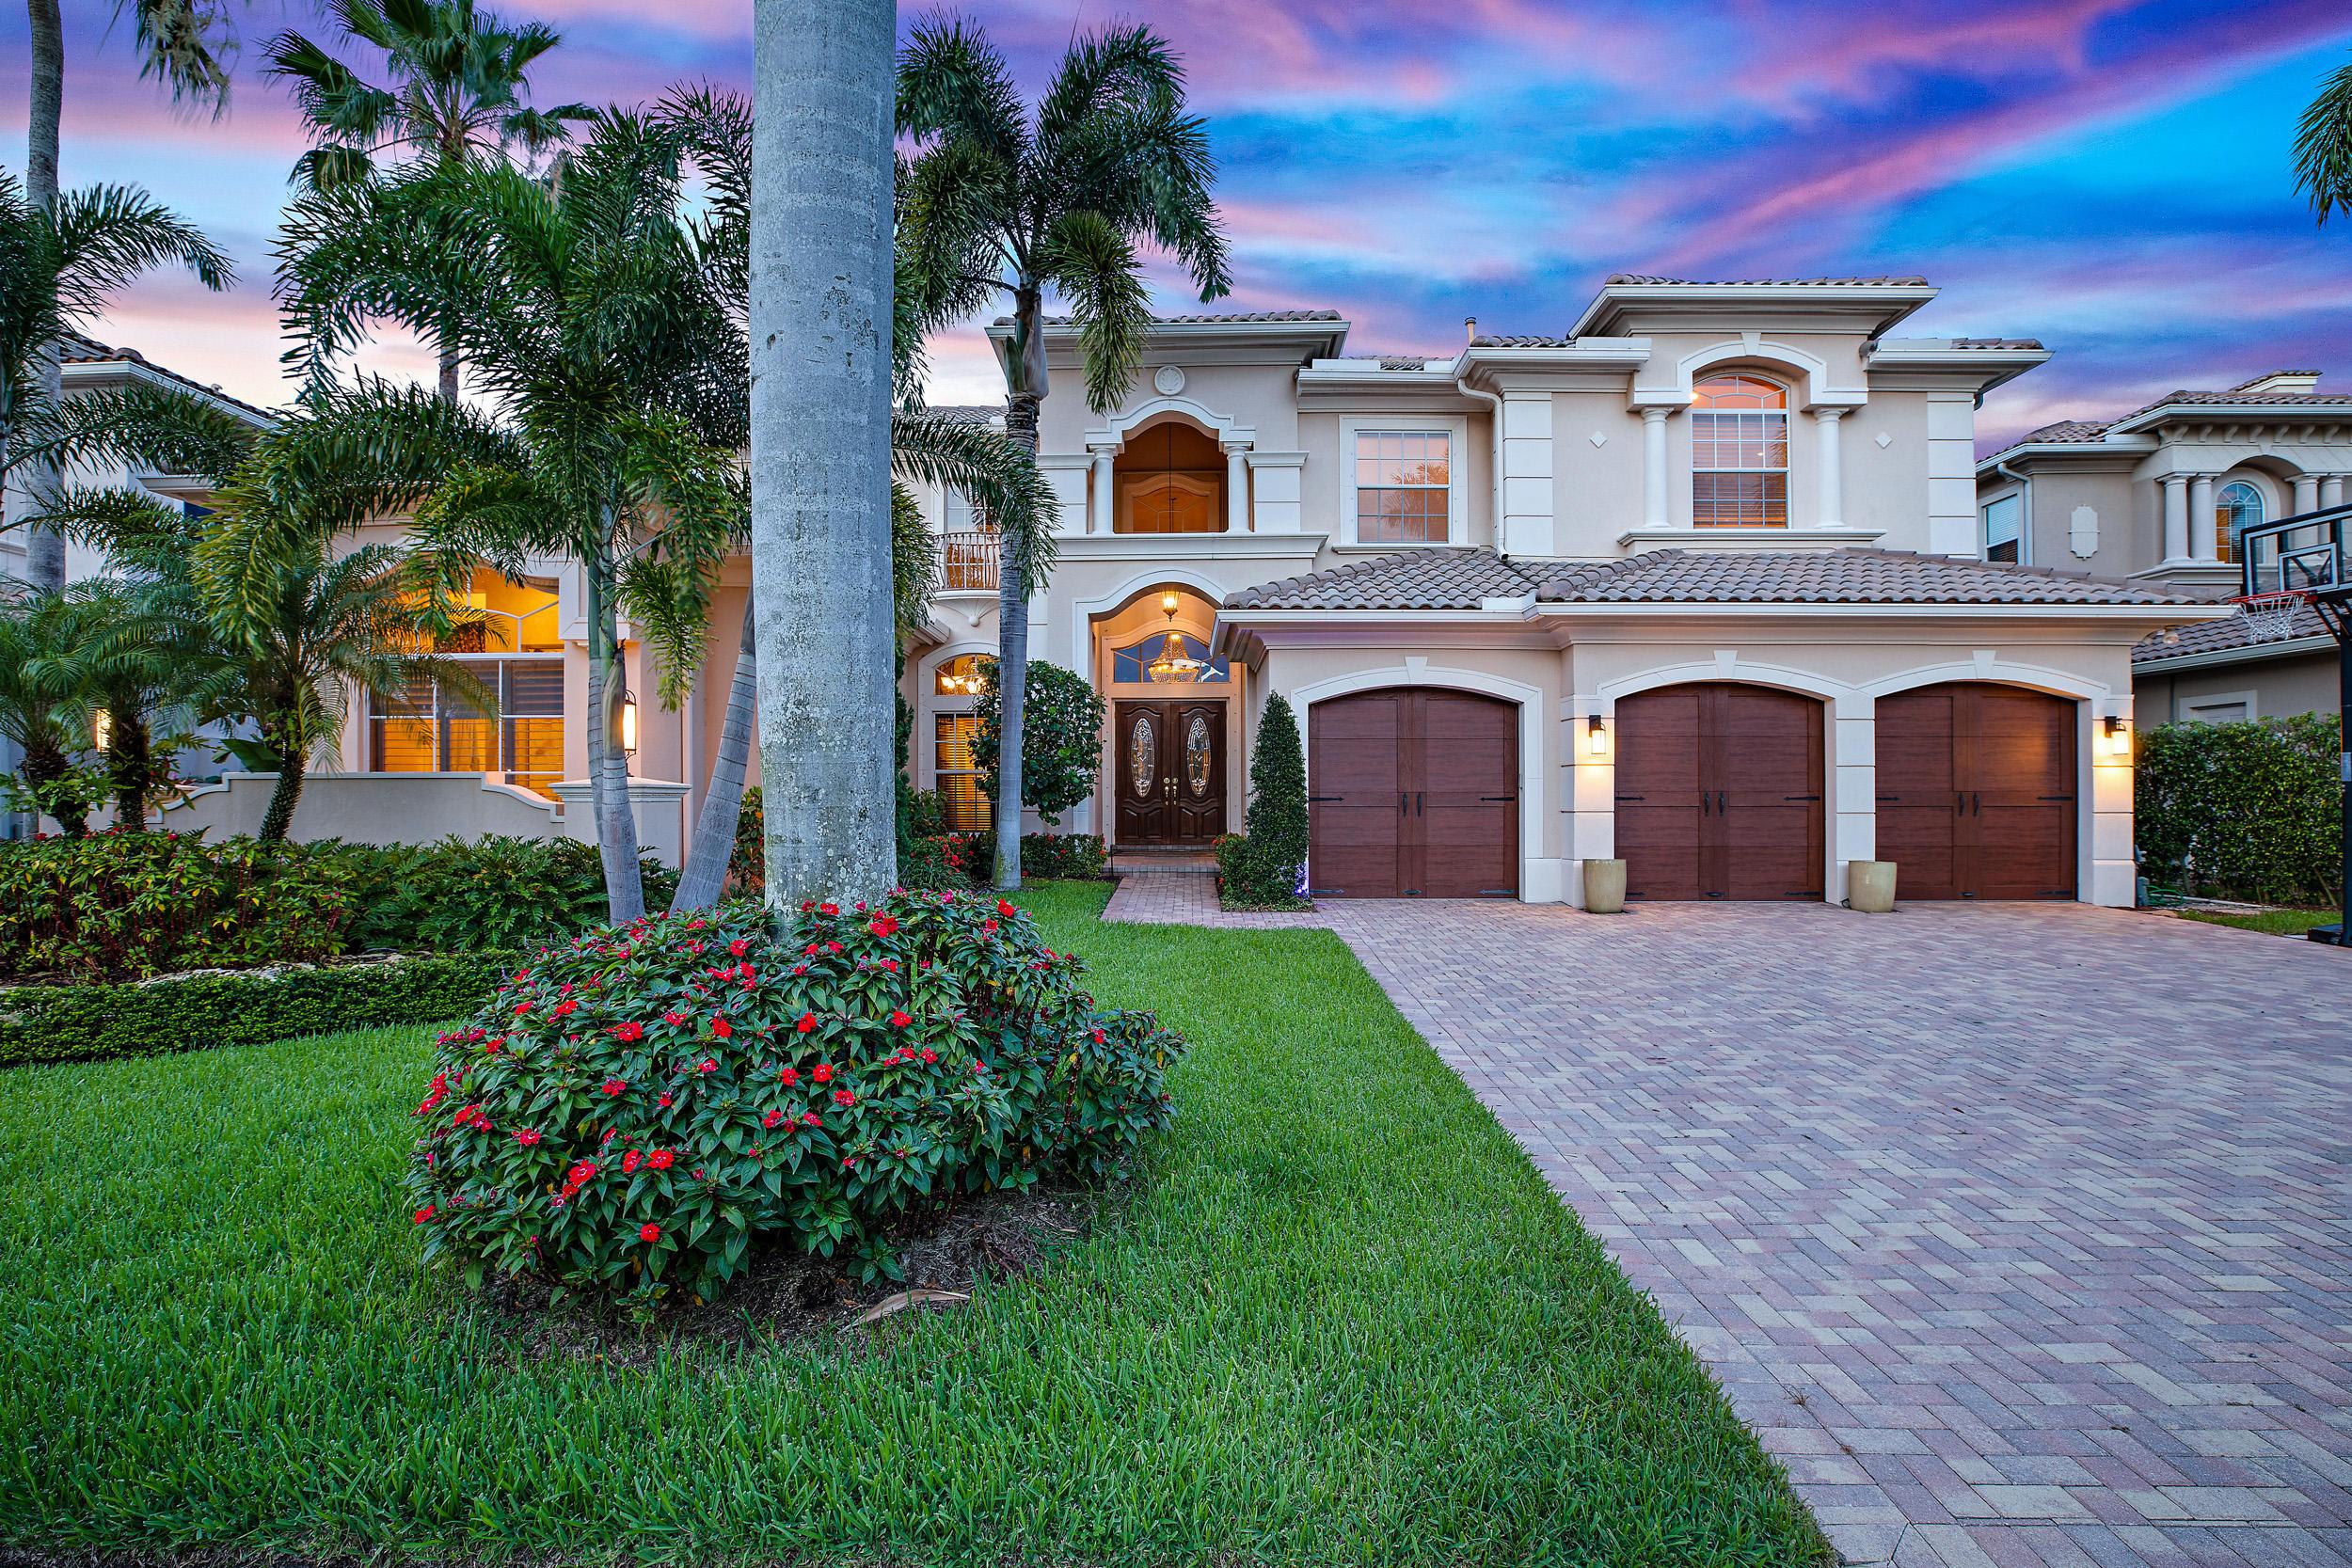 477 Savoie Drive, Palm Beach Gardens, Florida 33410, 6 Bedrooms Bedrooms, ,5.2 BathroomsBathrooms,A,Single family,Savoie,RX-10452483